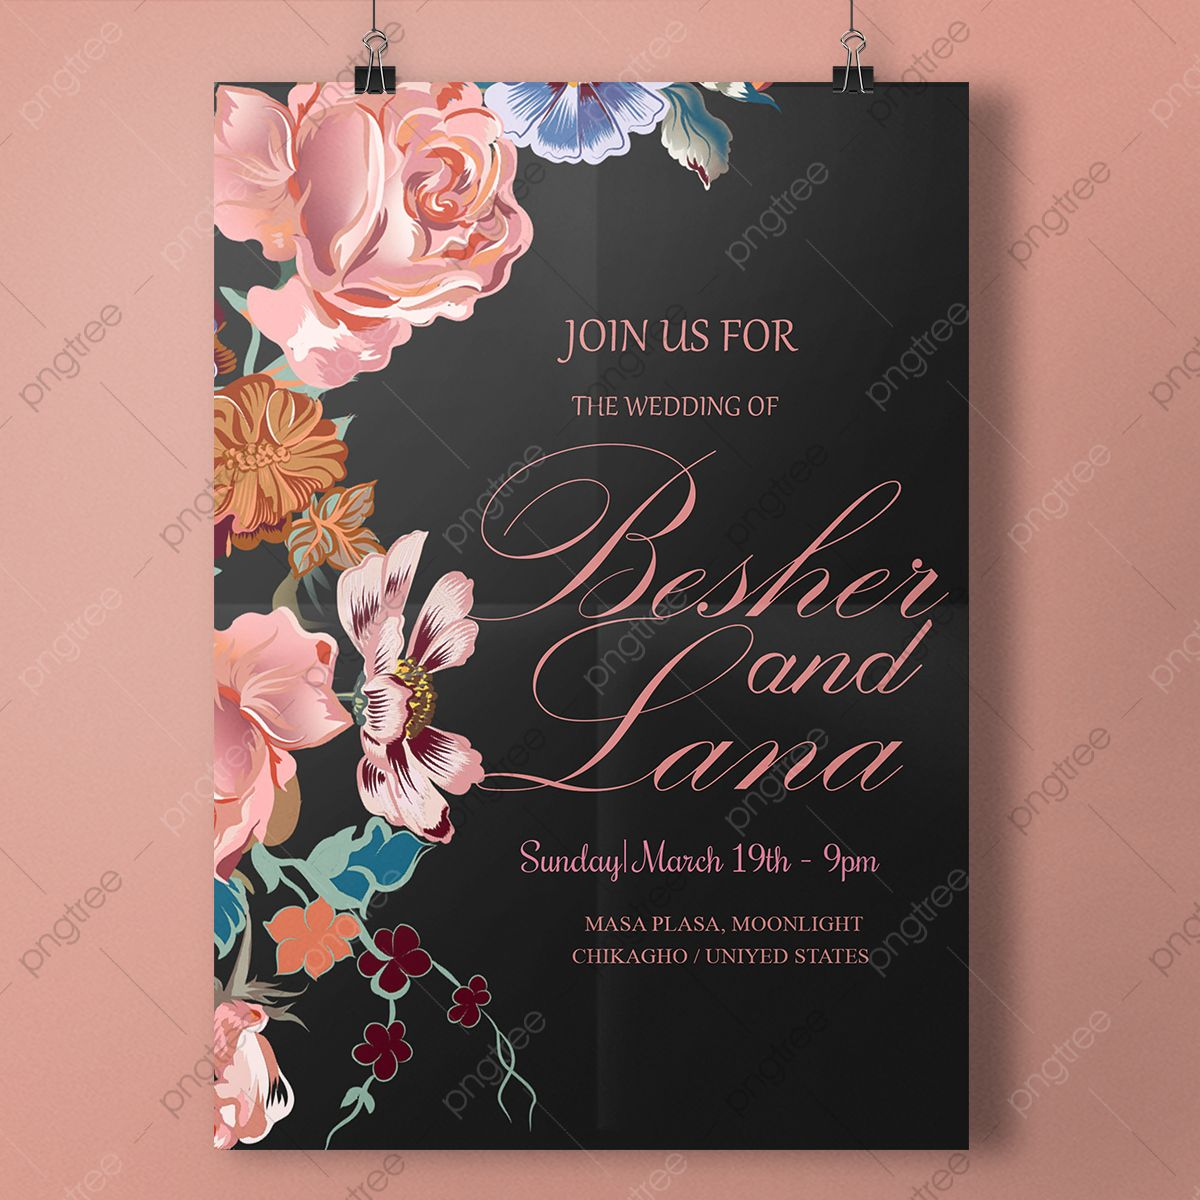 007 Imposing Editable Wedding Invitation Template Photo  Templates Tamil Card Free Download Psd OnlineFull